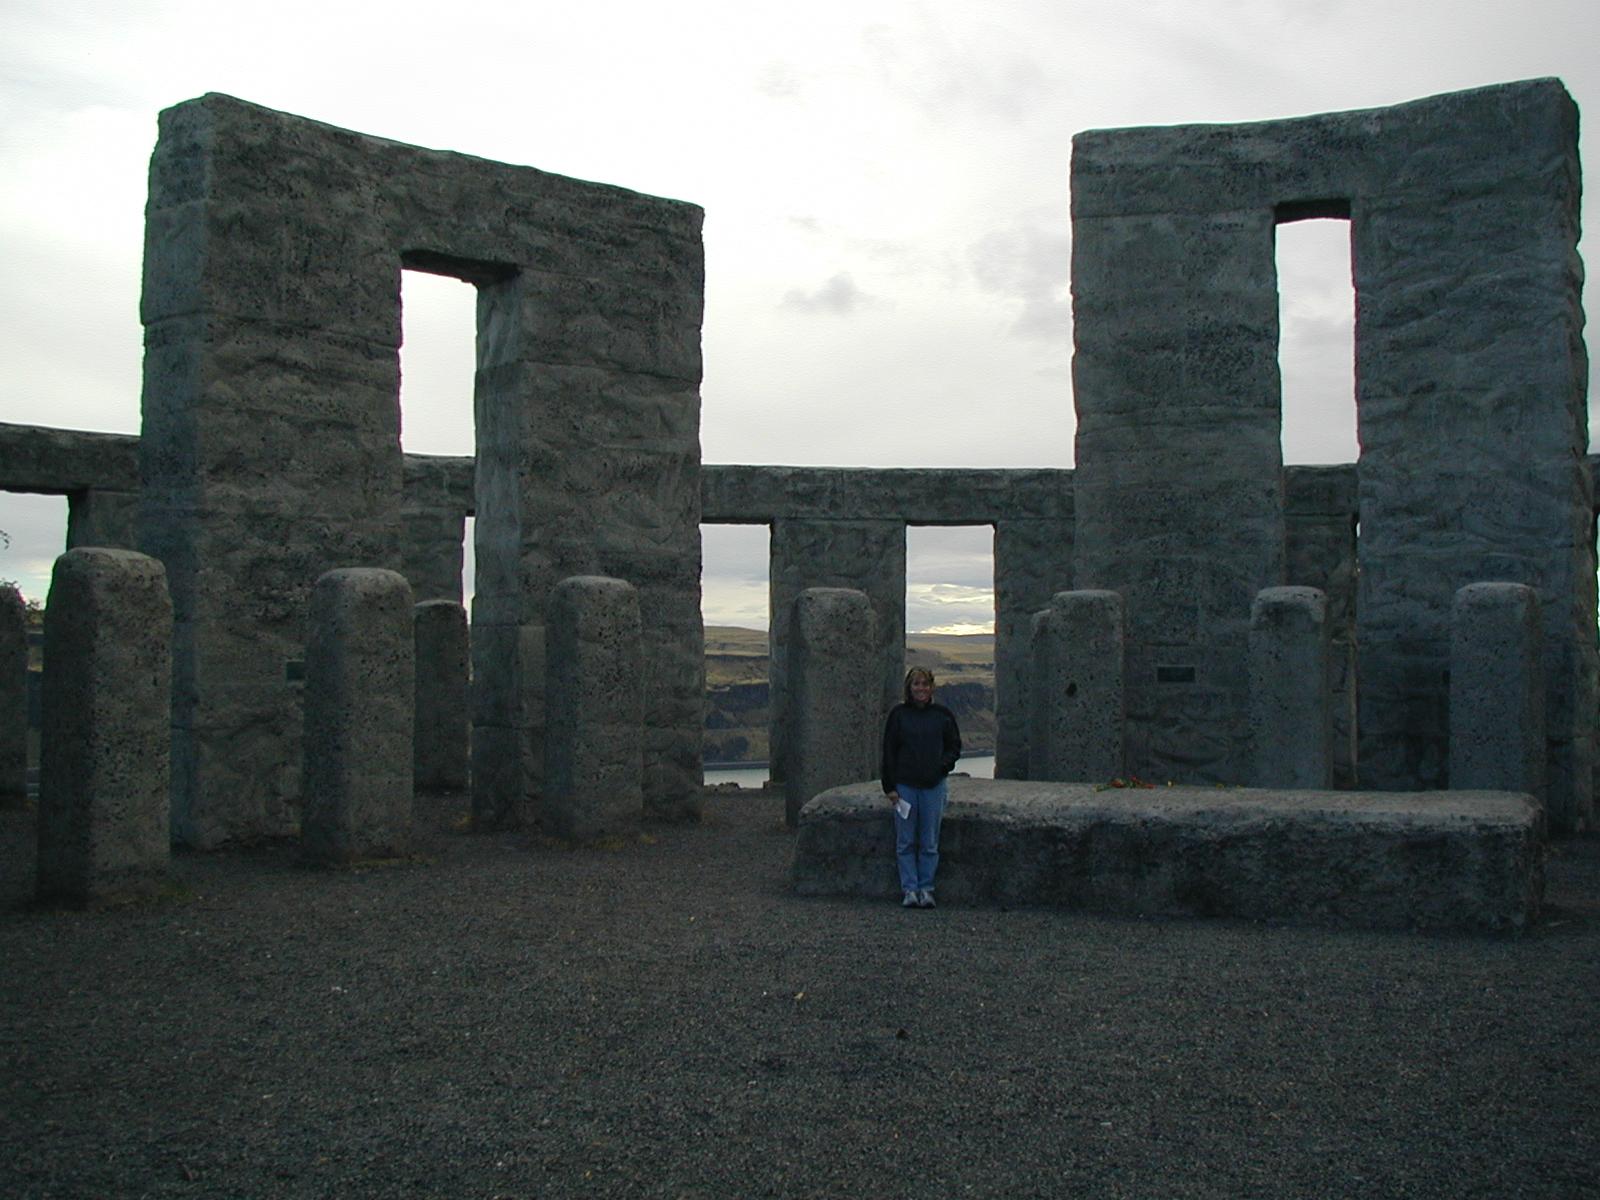 At Stonehenge